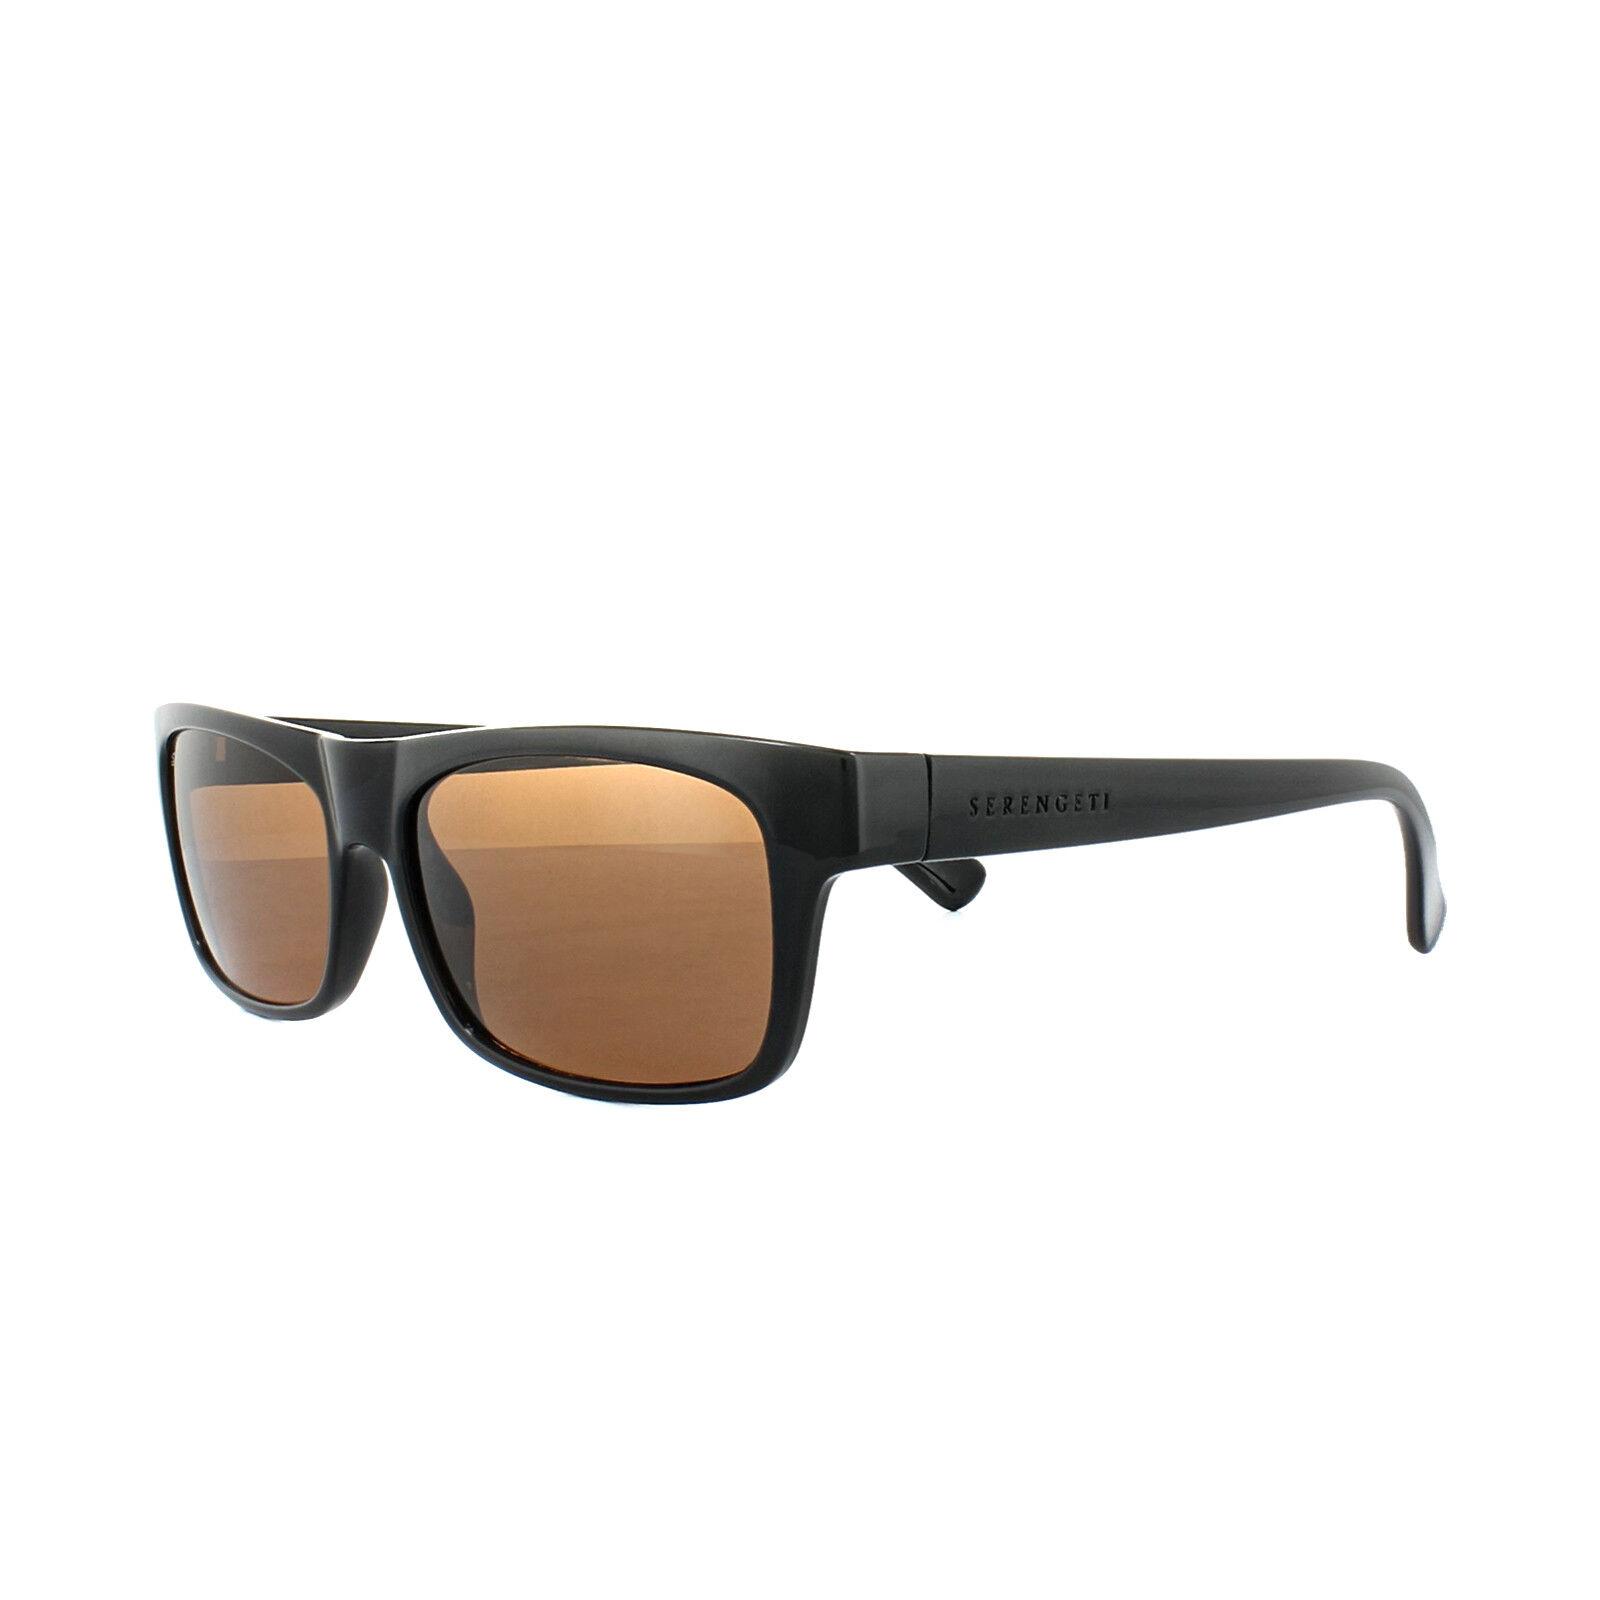 a266333b8e Serengeti Sunglasses Rapallo 8364 Shiny Black Drivers Brown ...